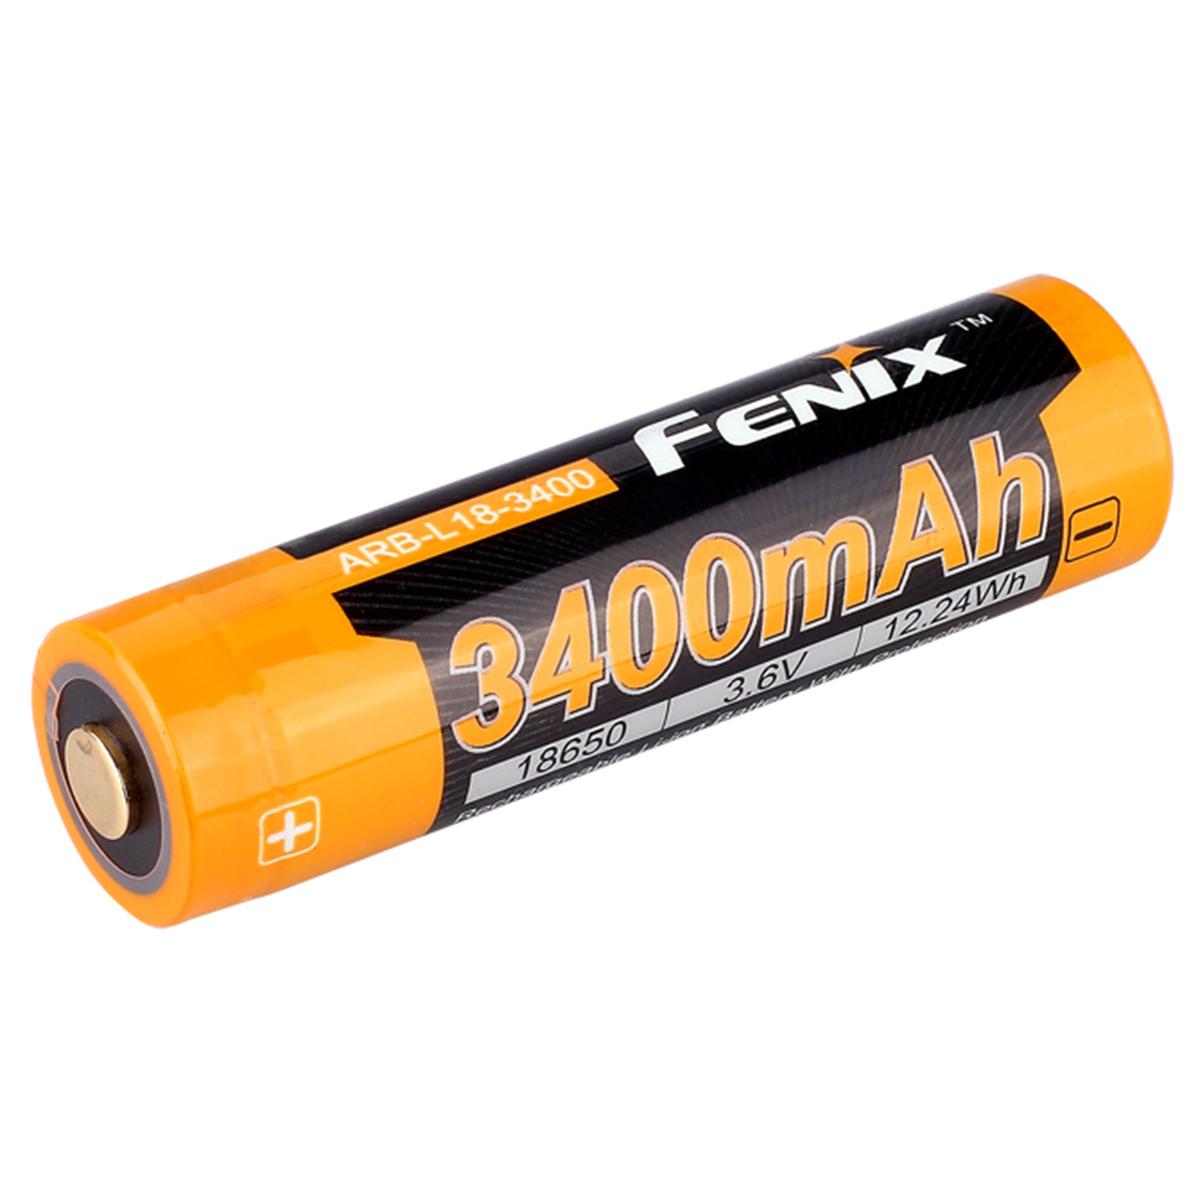 Аккумулятор 18650 3400 mAh Fenix ARB-L18, защищенный